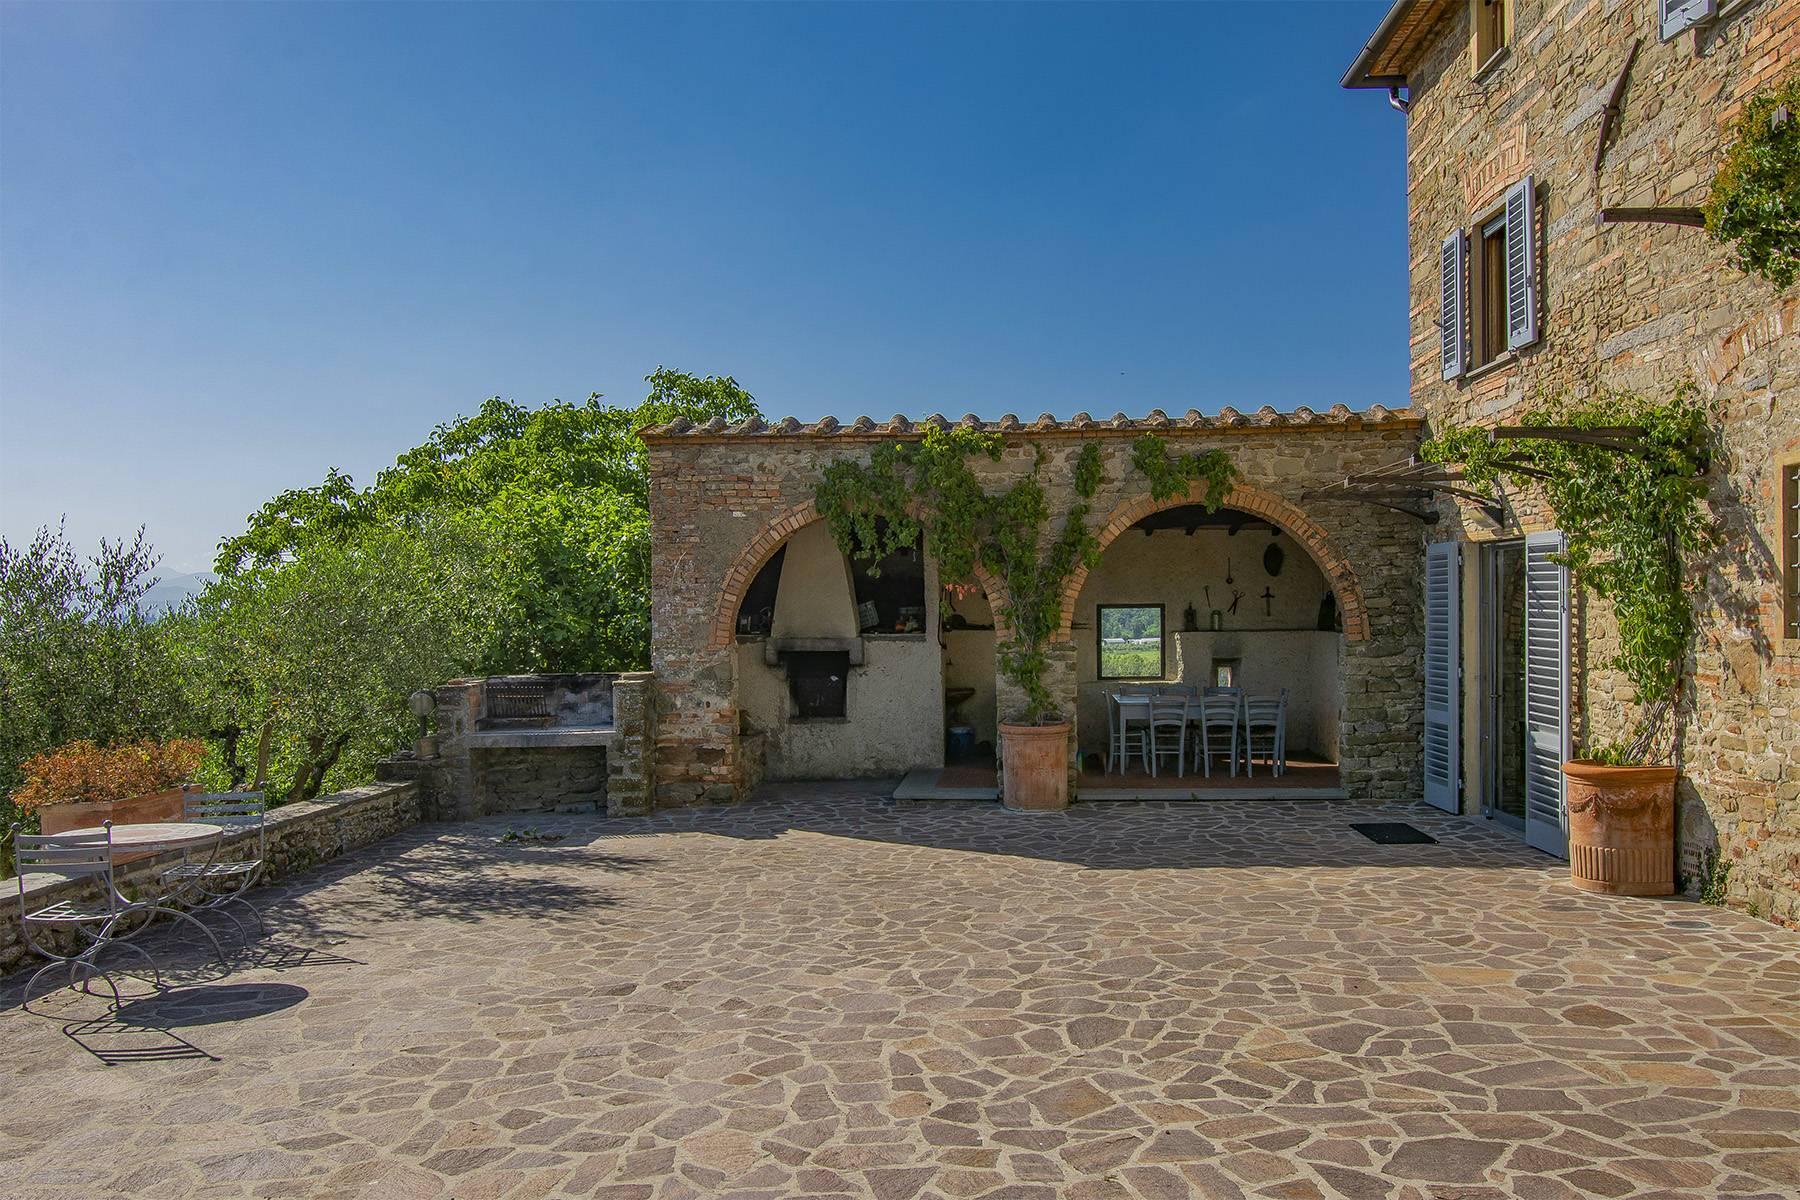 Farmhouse nestled on the Tuscan hills - 4